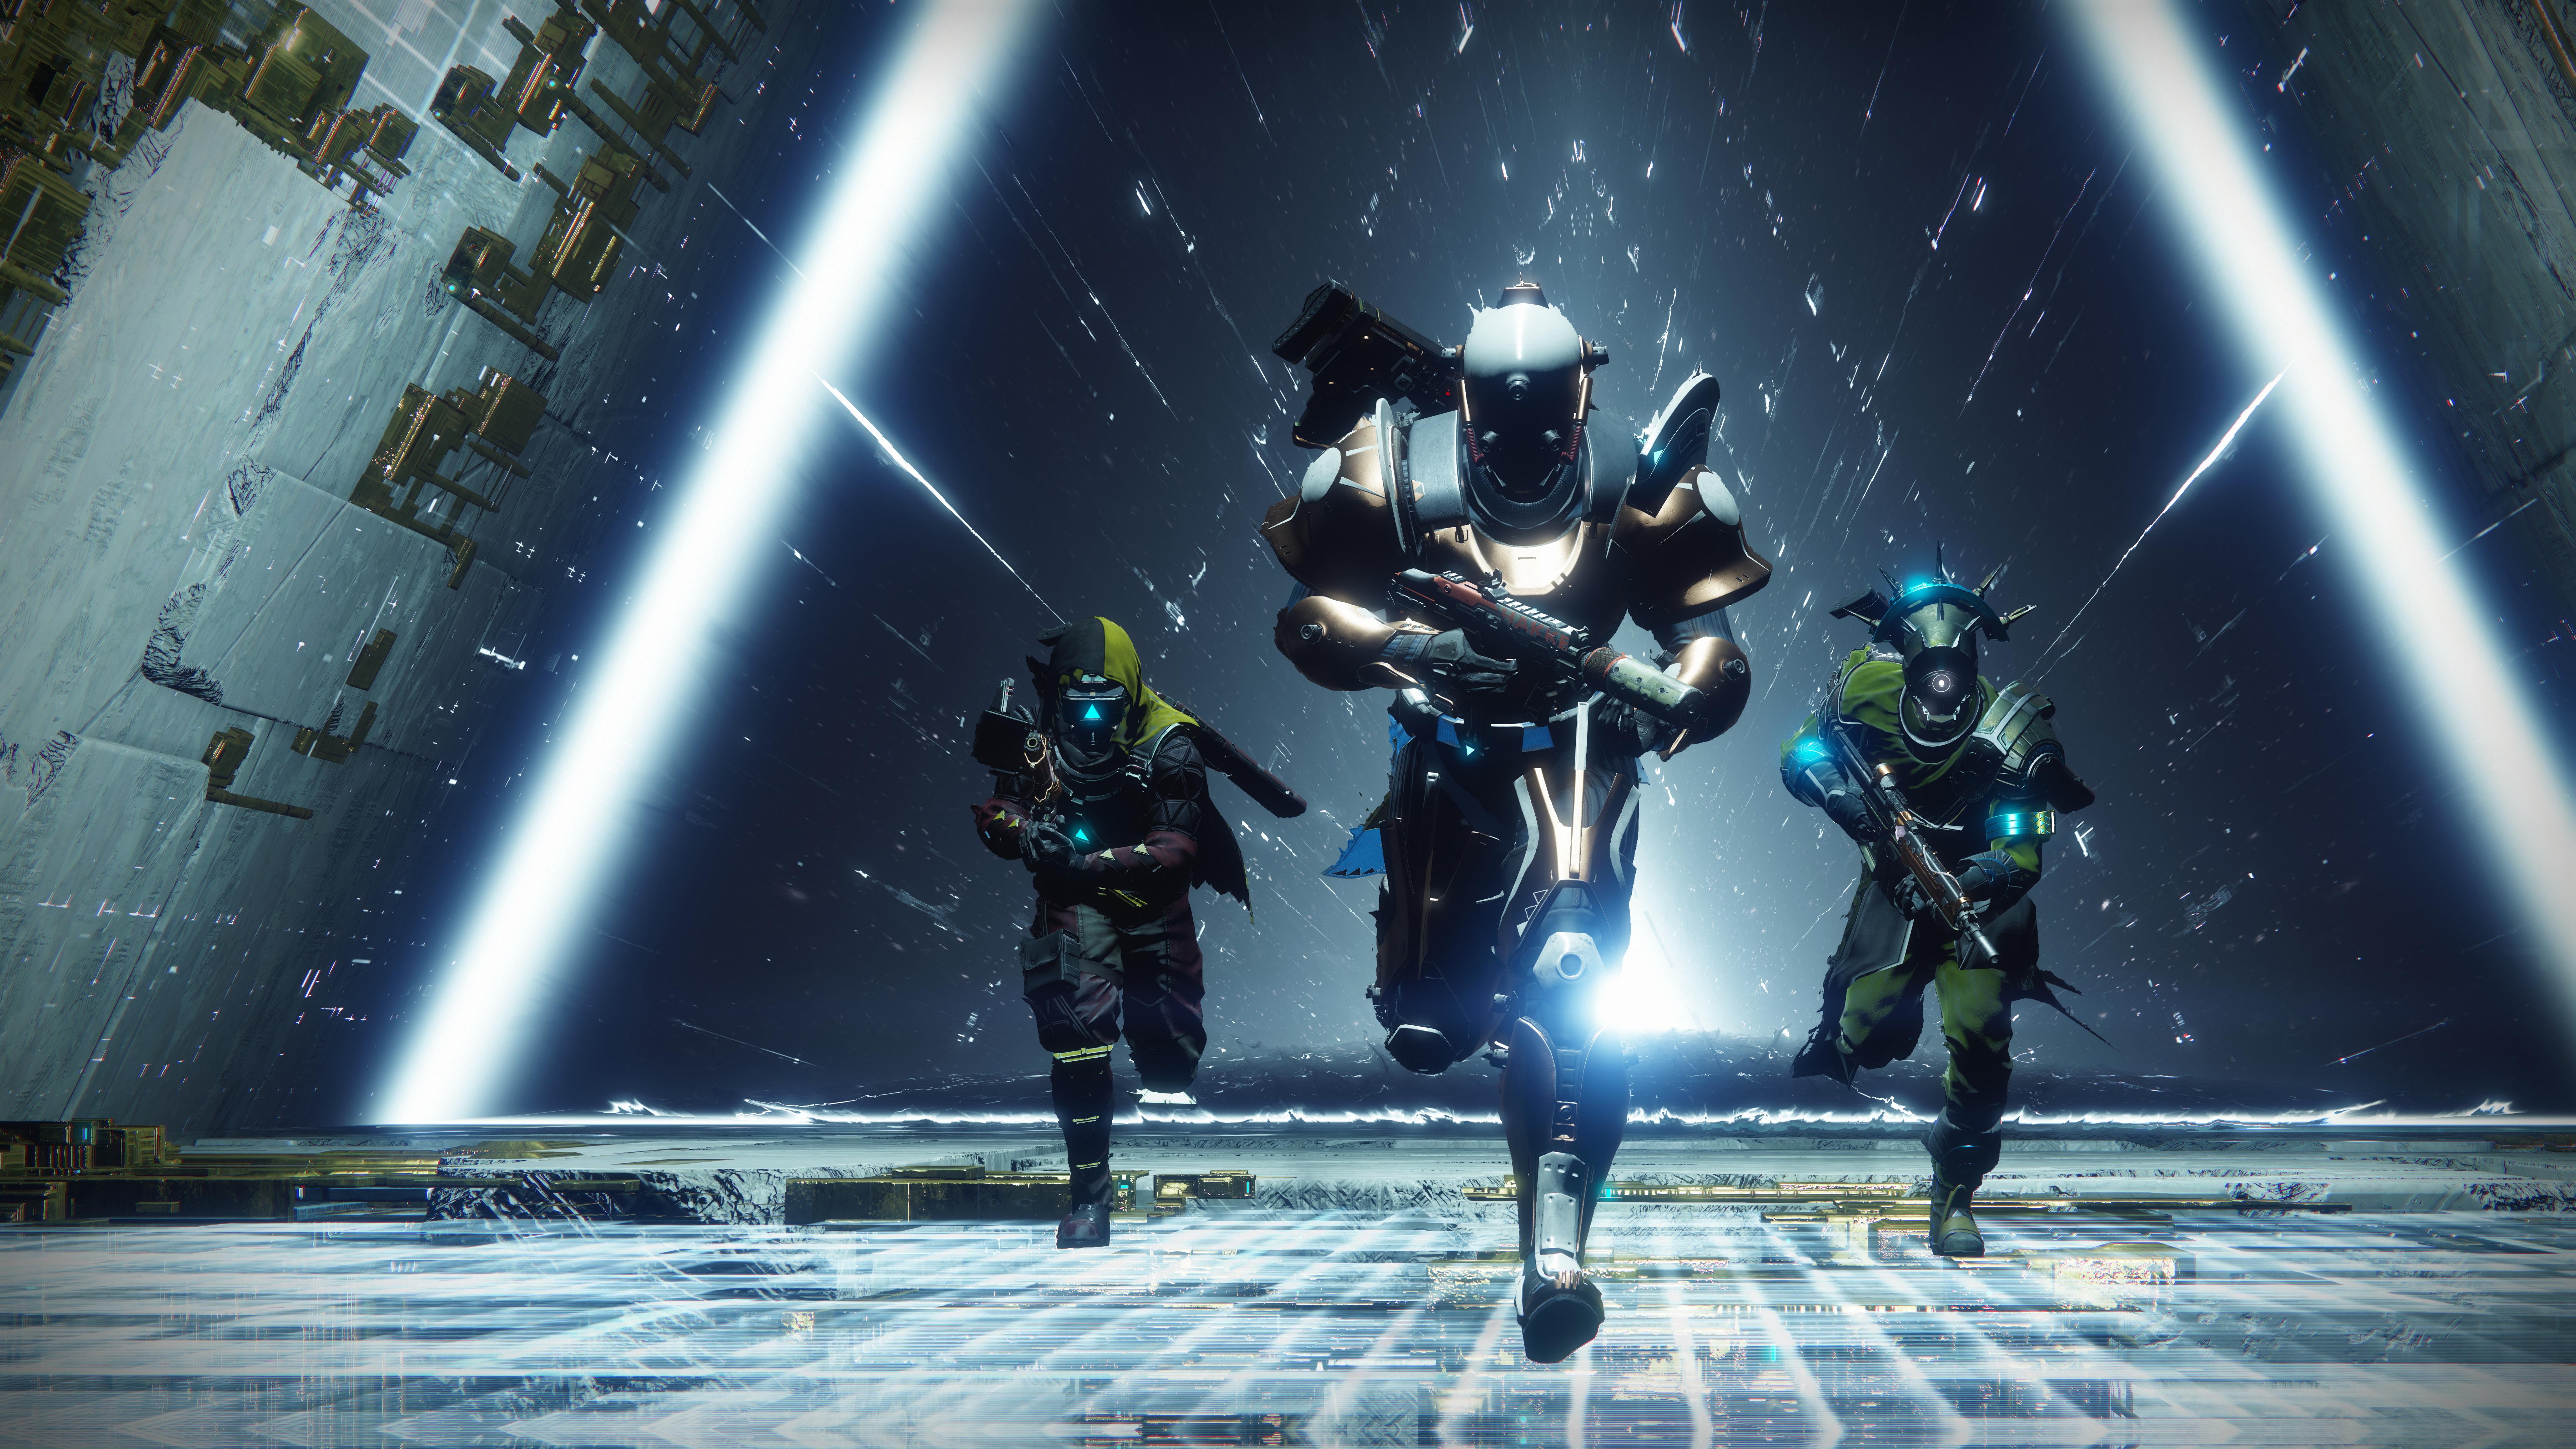 A Newcomer's Guide To Destiny 2